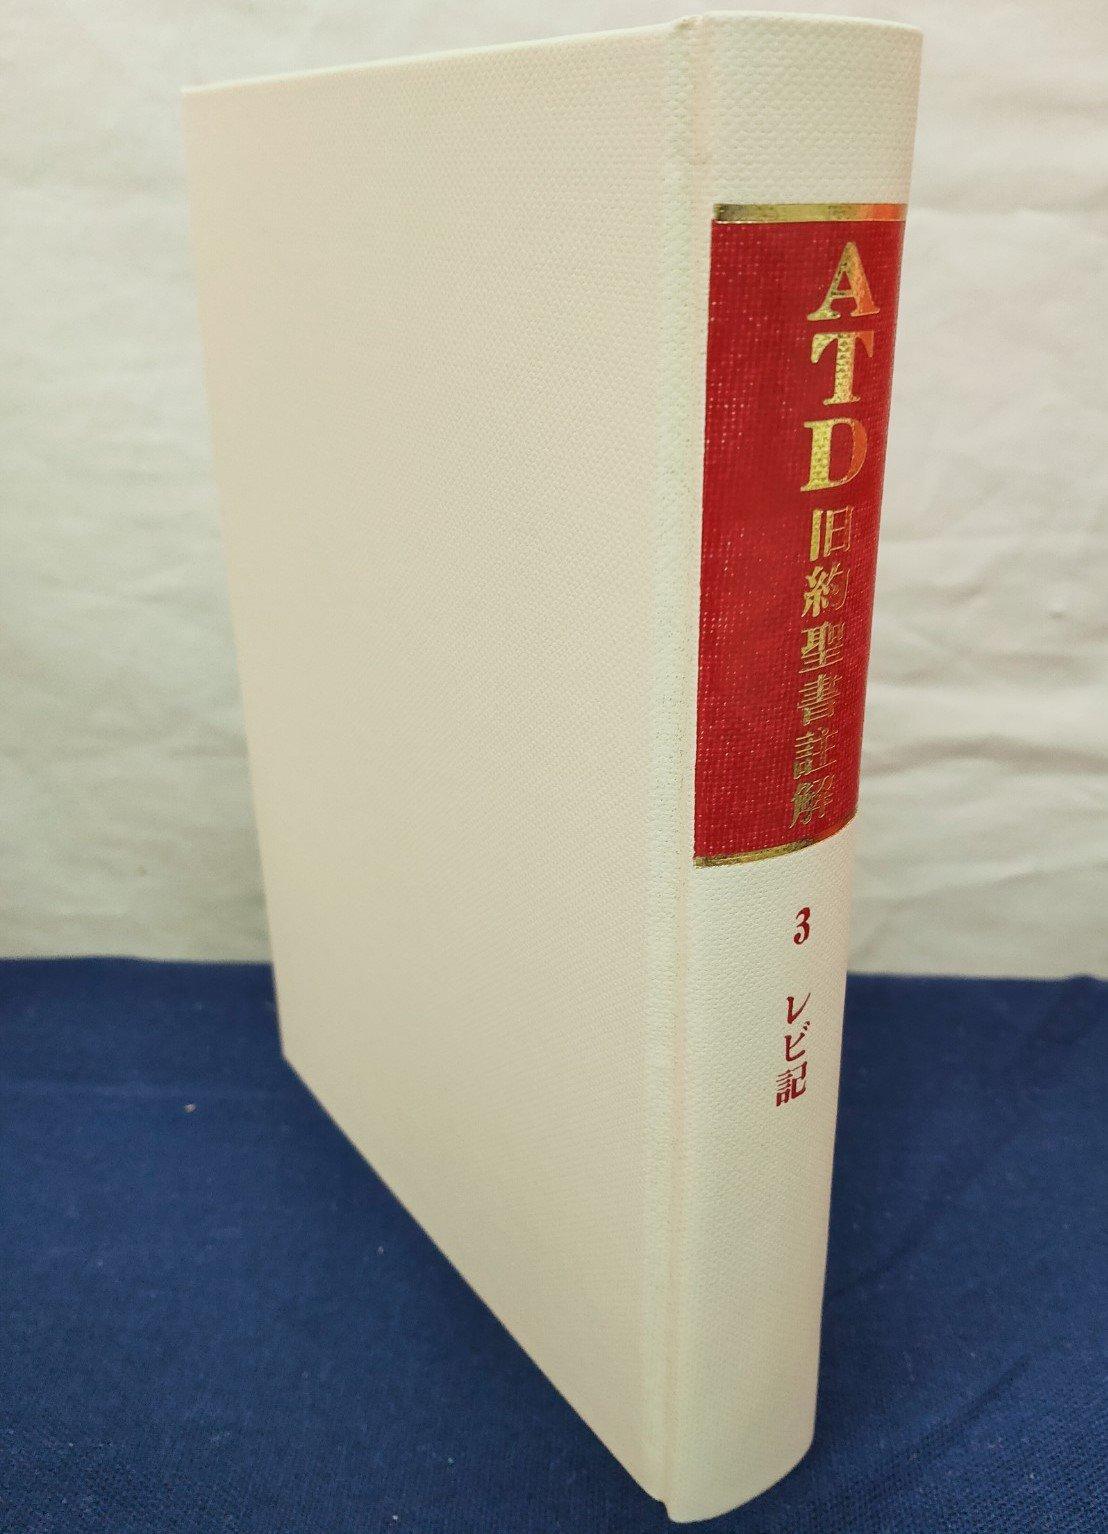 ATD旧約聖書註解3 レビ記の商品画像